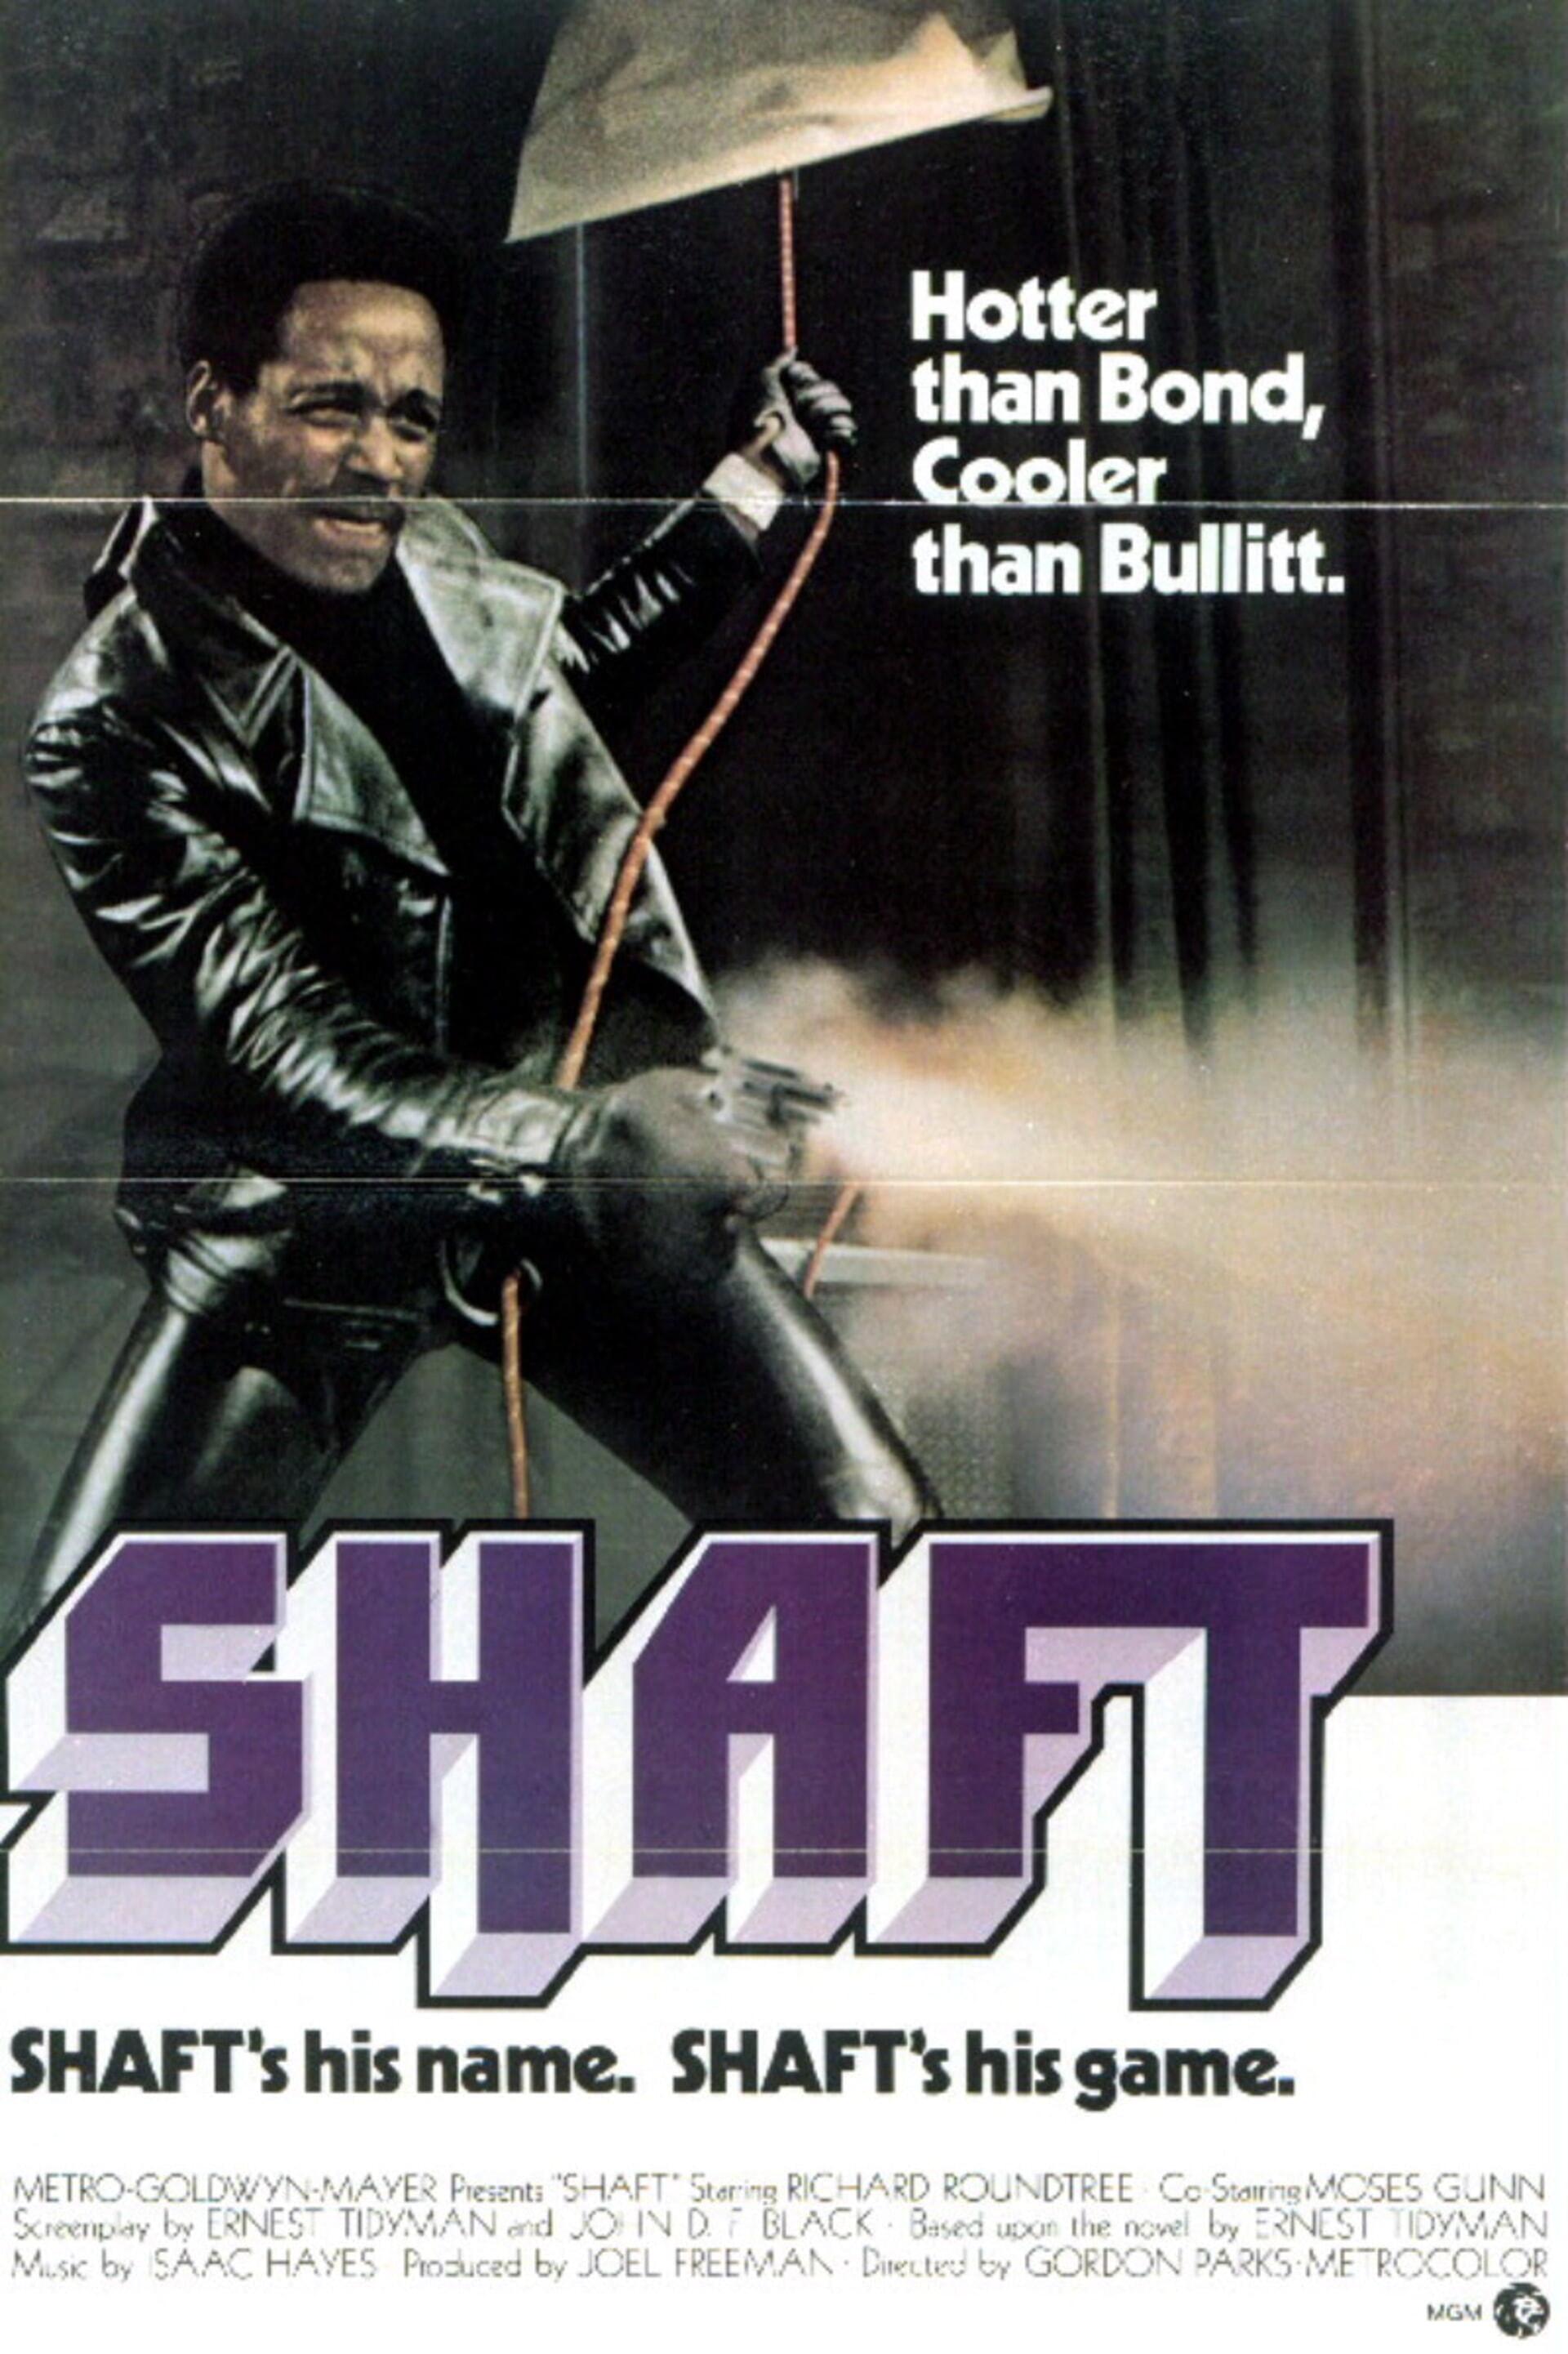 Shaft (1971) - Poster 1